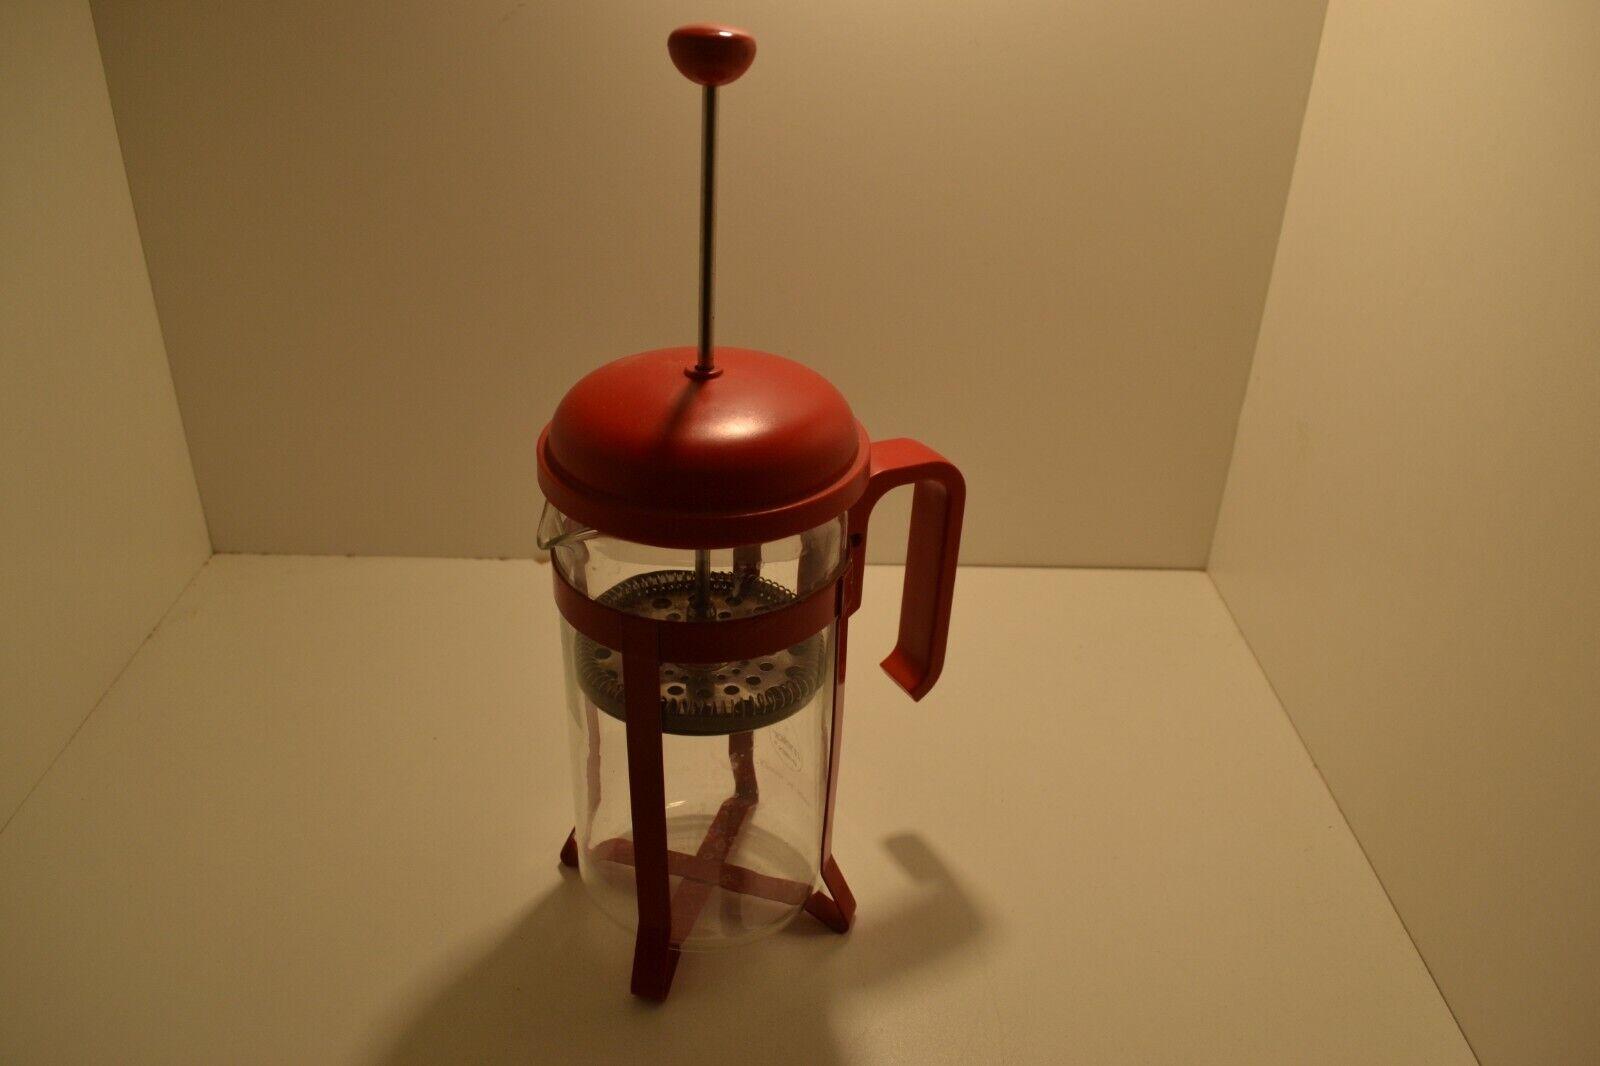 Cafetiere  marque melior  n°8 verre pyrex  rouge cafe france